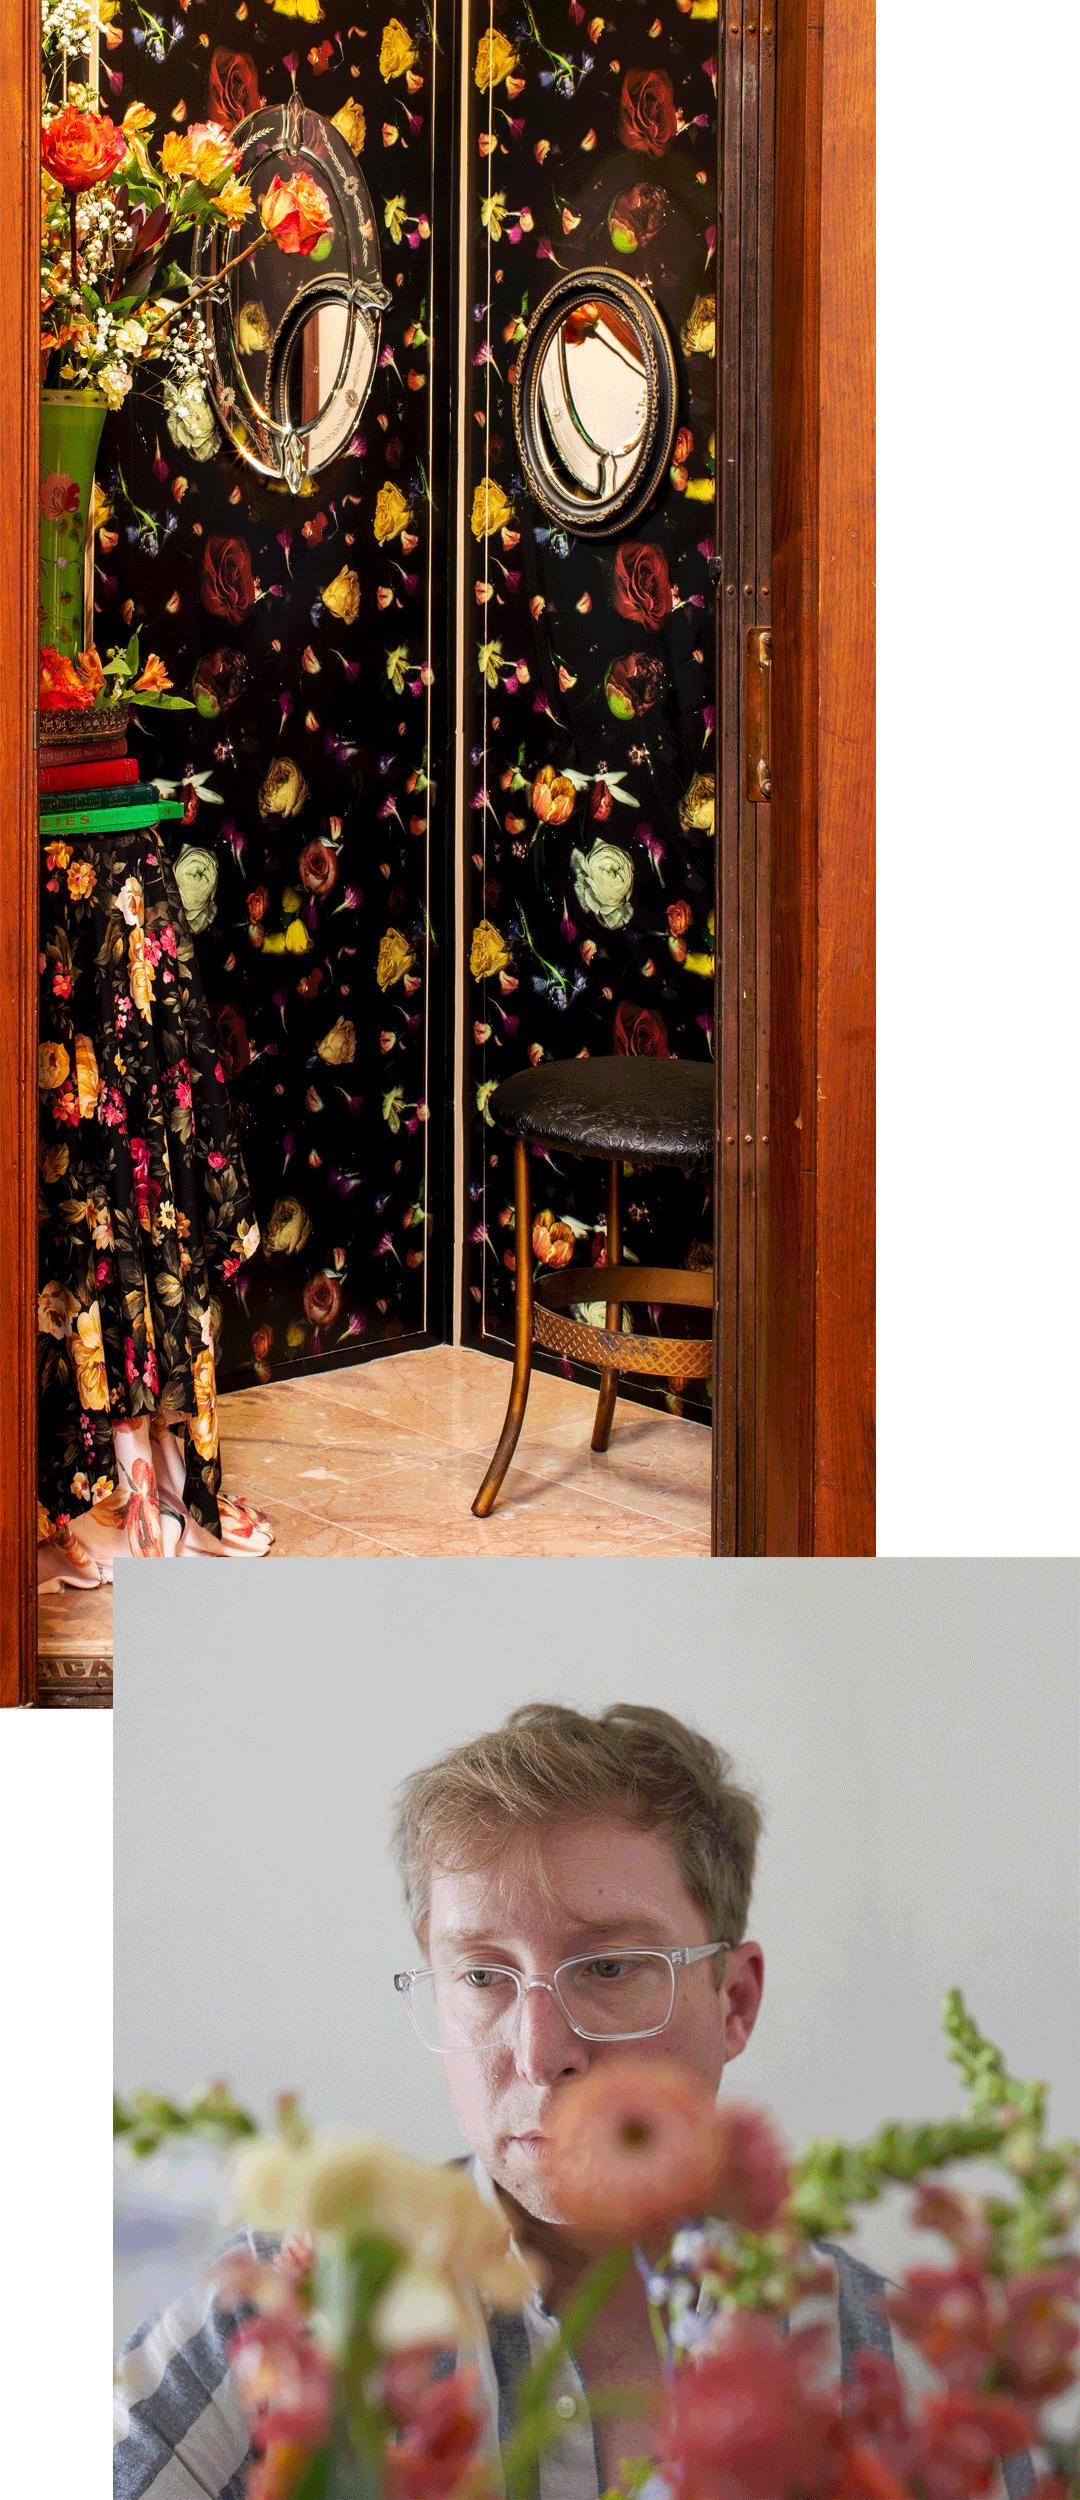 Reverberation by Delaney Allen | MASSIVart - Art Curator Services